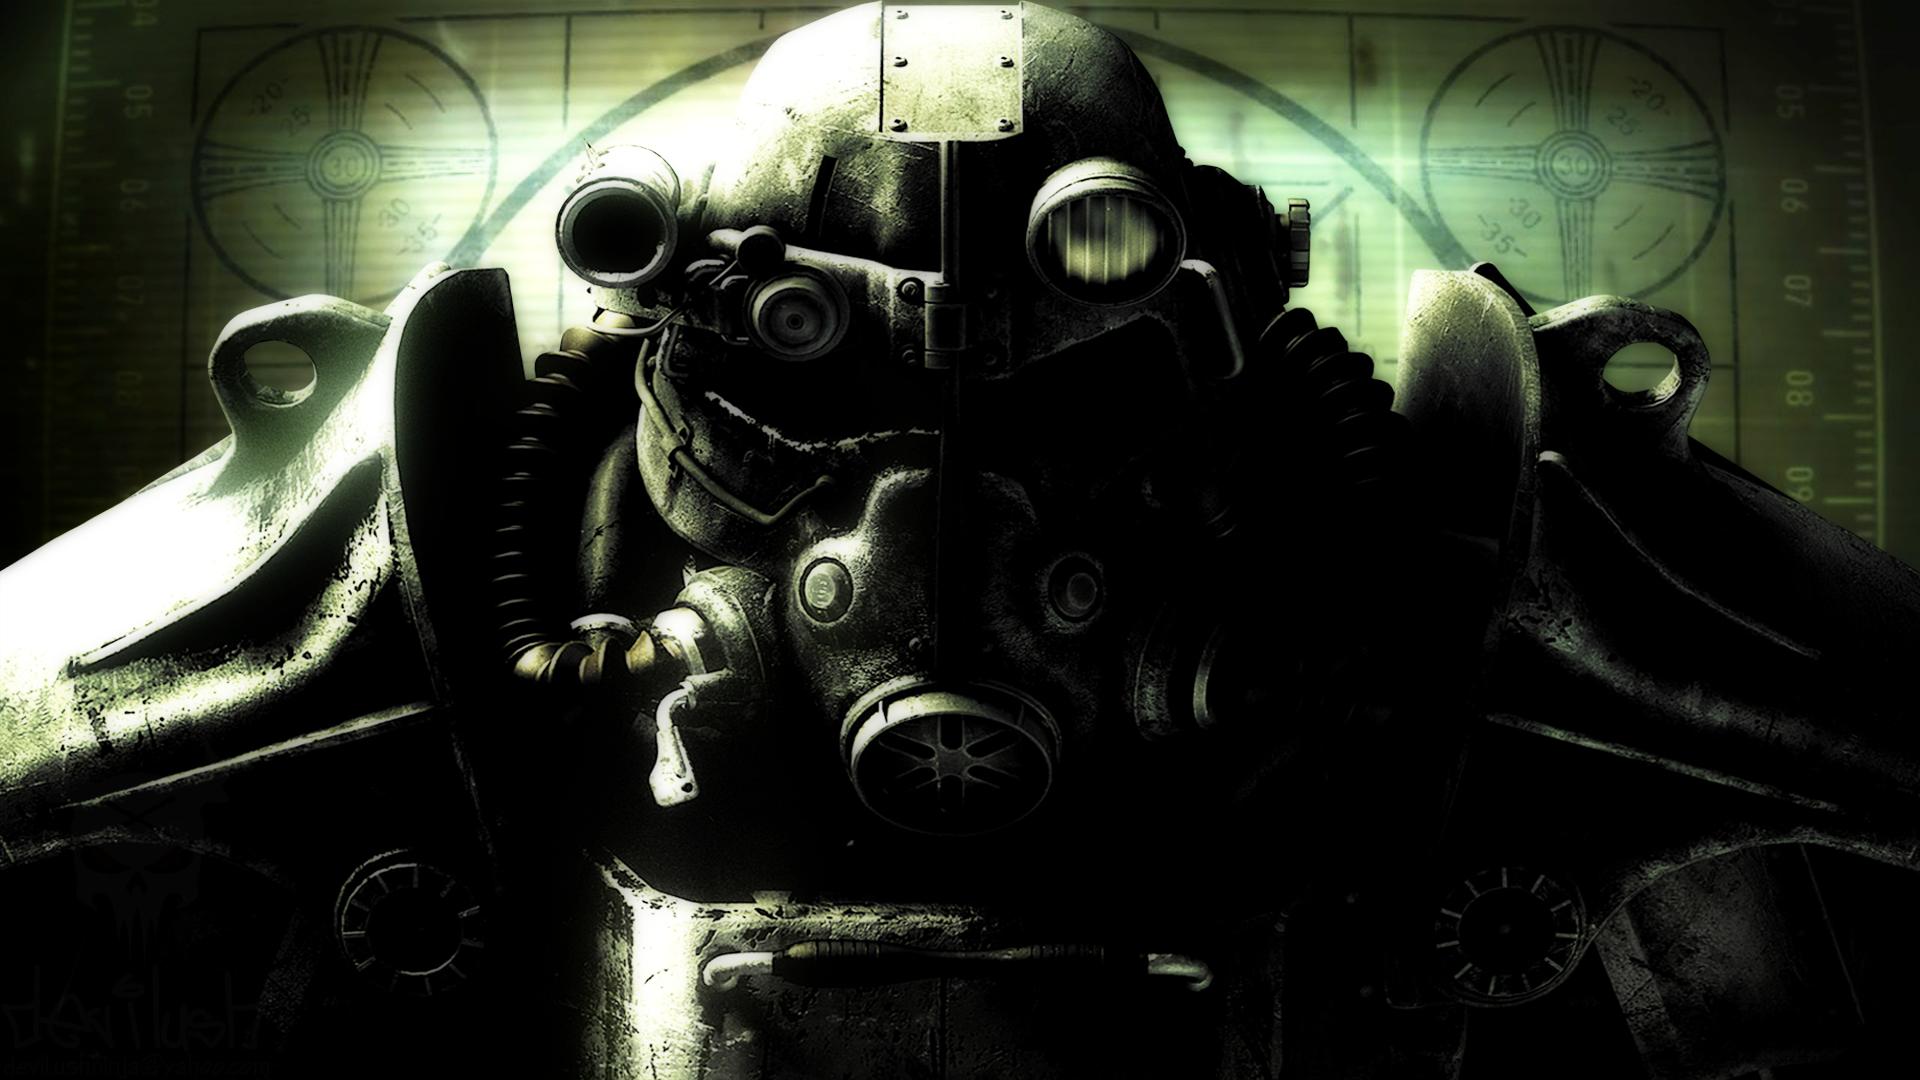 Brotherhood Wallpaper 1920x1080 Fallout Brotherhood Of Steel 1920x1080